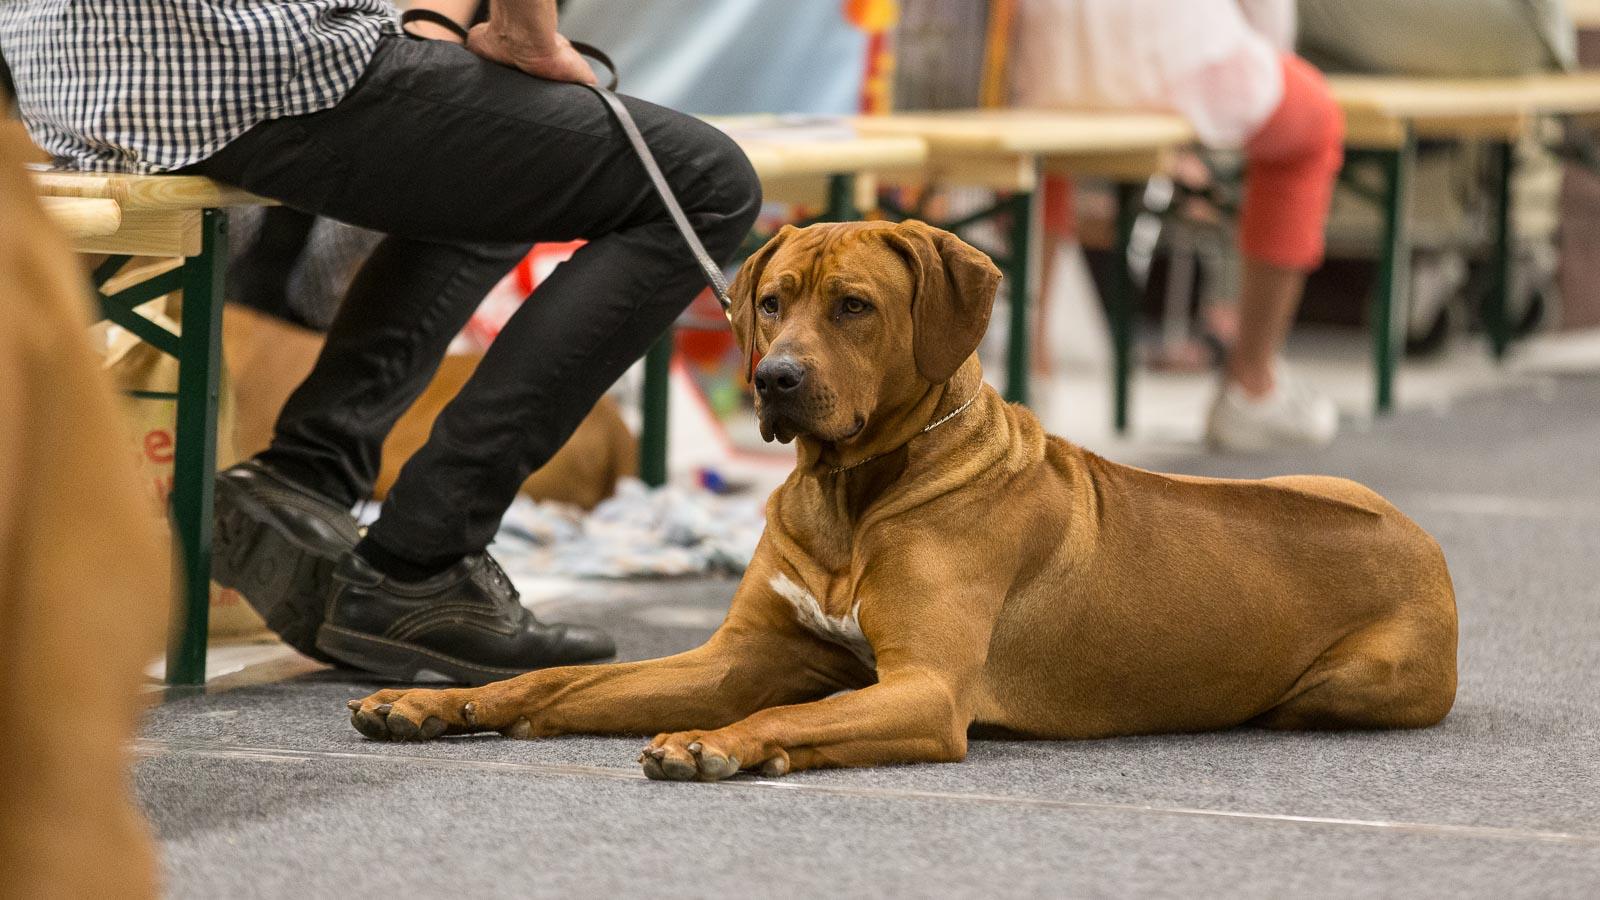 dogshow_oss_Kynoweb-20170527-10-11-25-KY2_2502-203019001225-